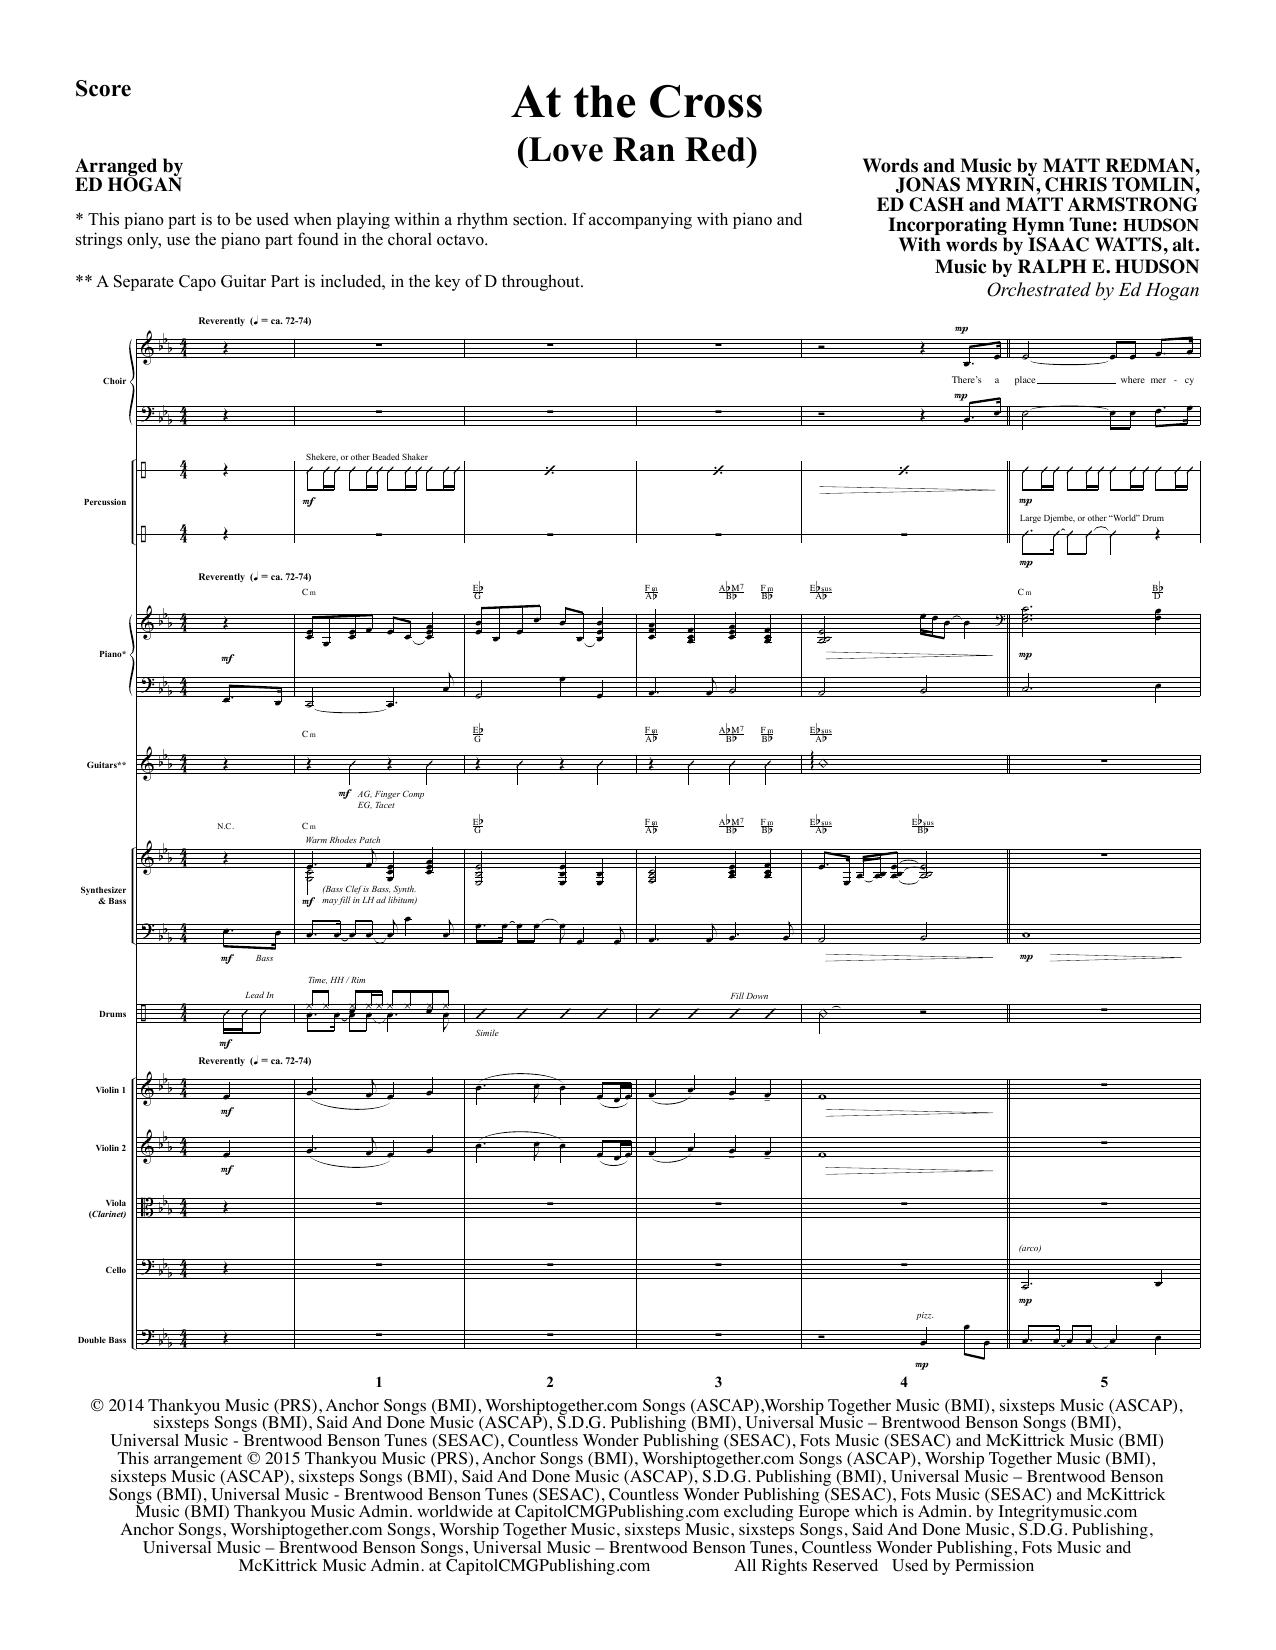 At the Cross - Full Score sheet music